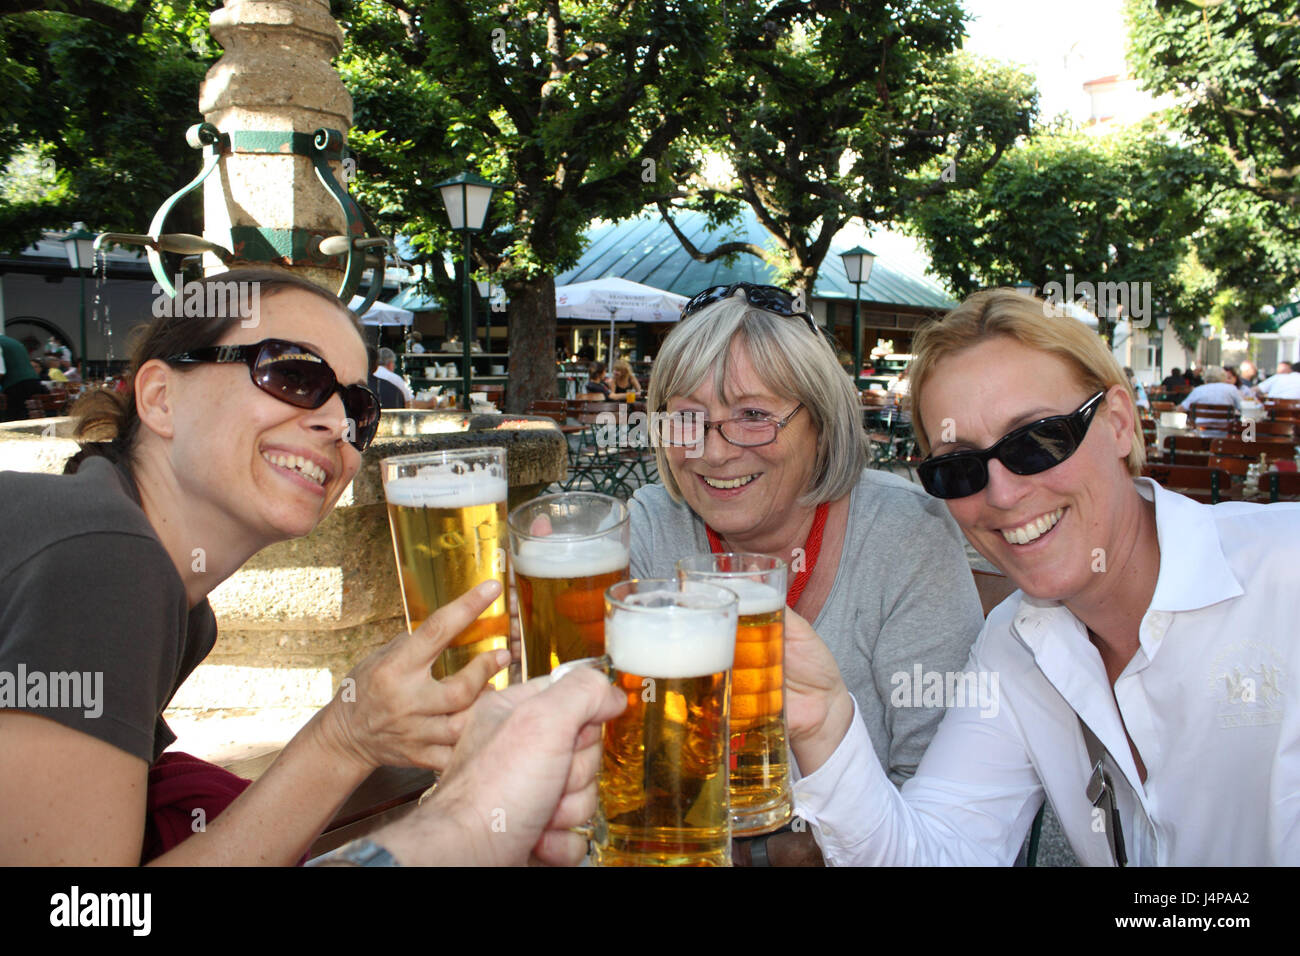 Austria, Linz, beer garden, three women, beer mugs, kick off, town, tourism, outside, cloister court, beer, fun, - Stock Image